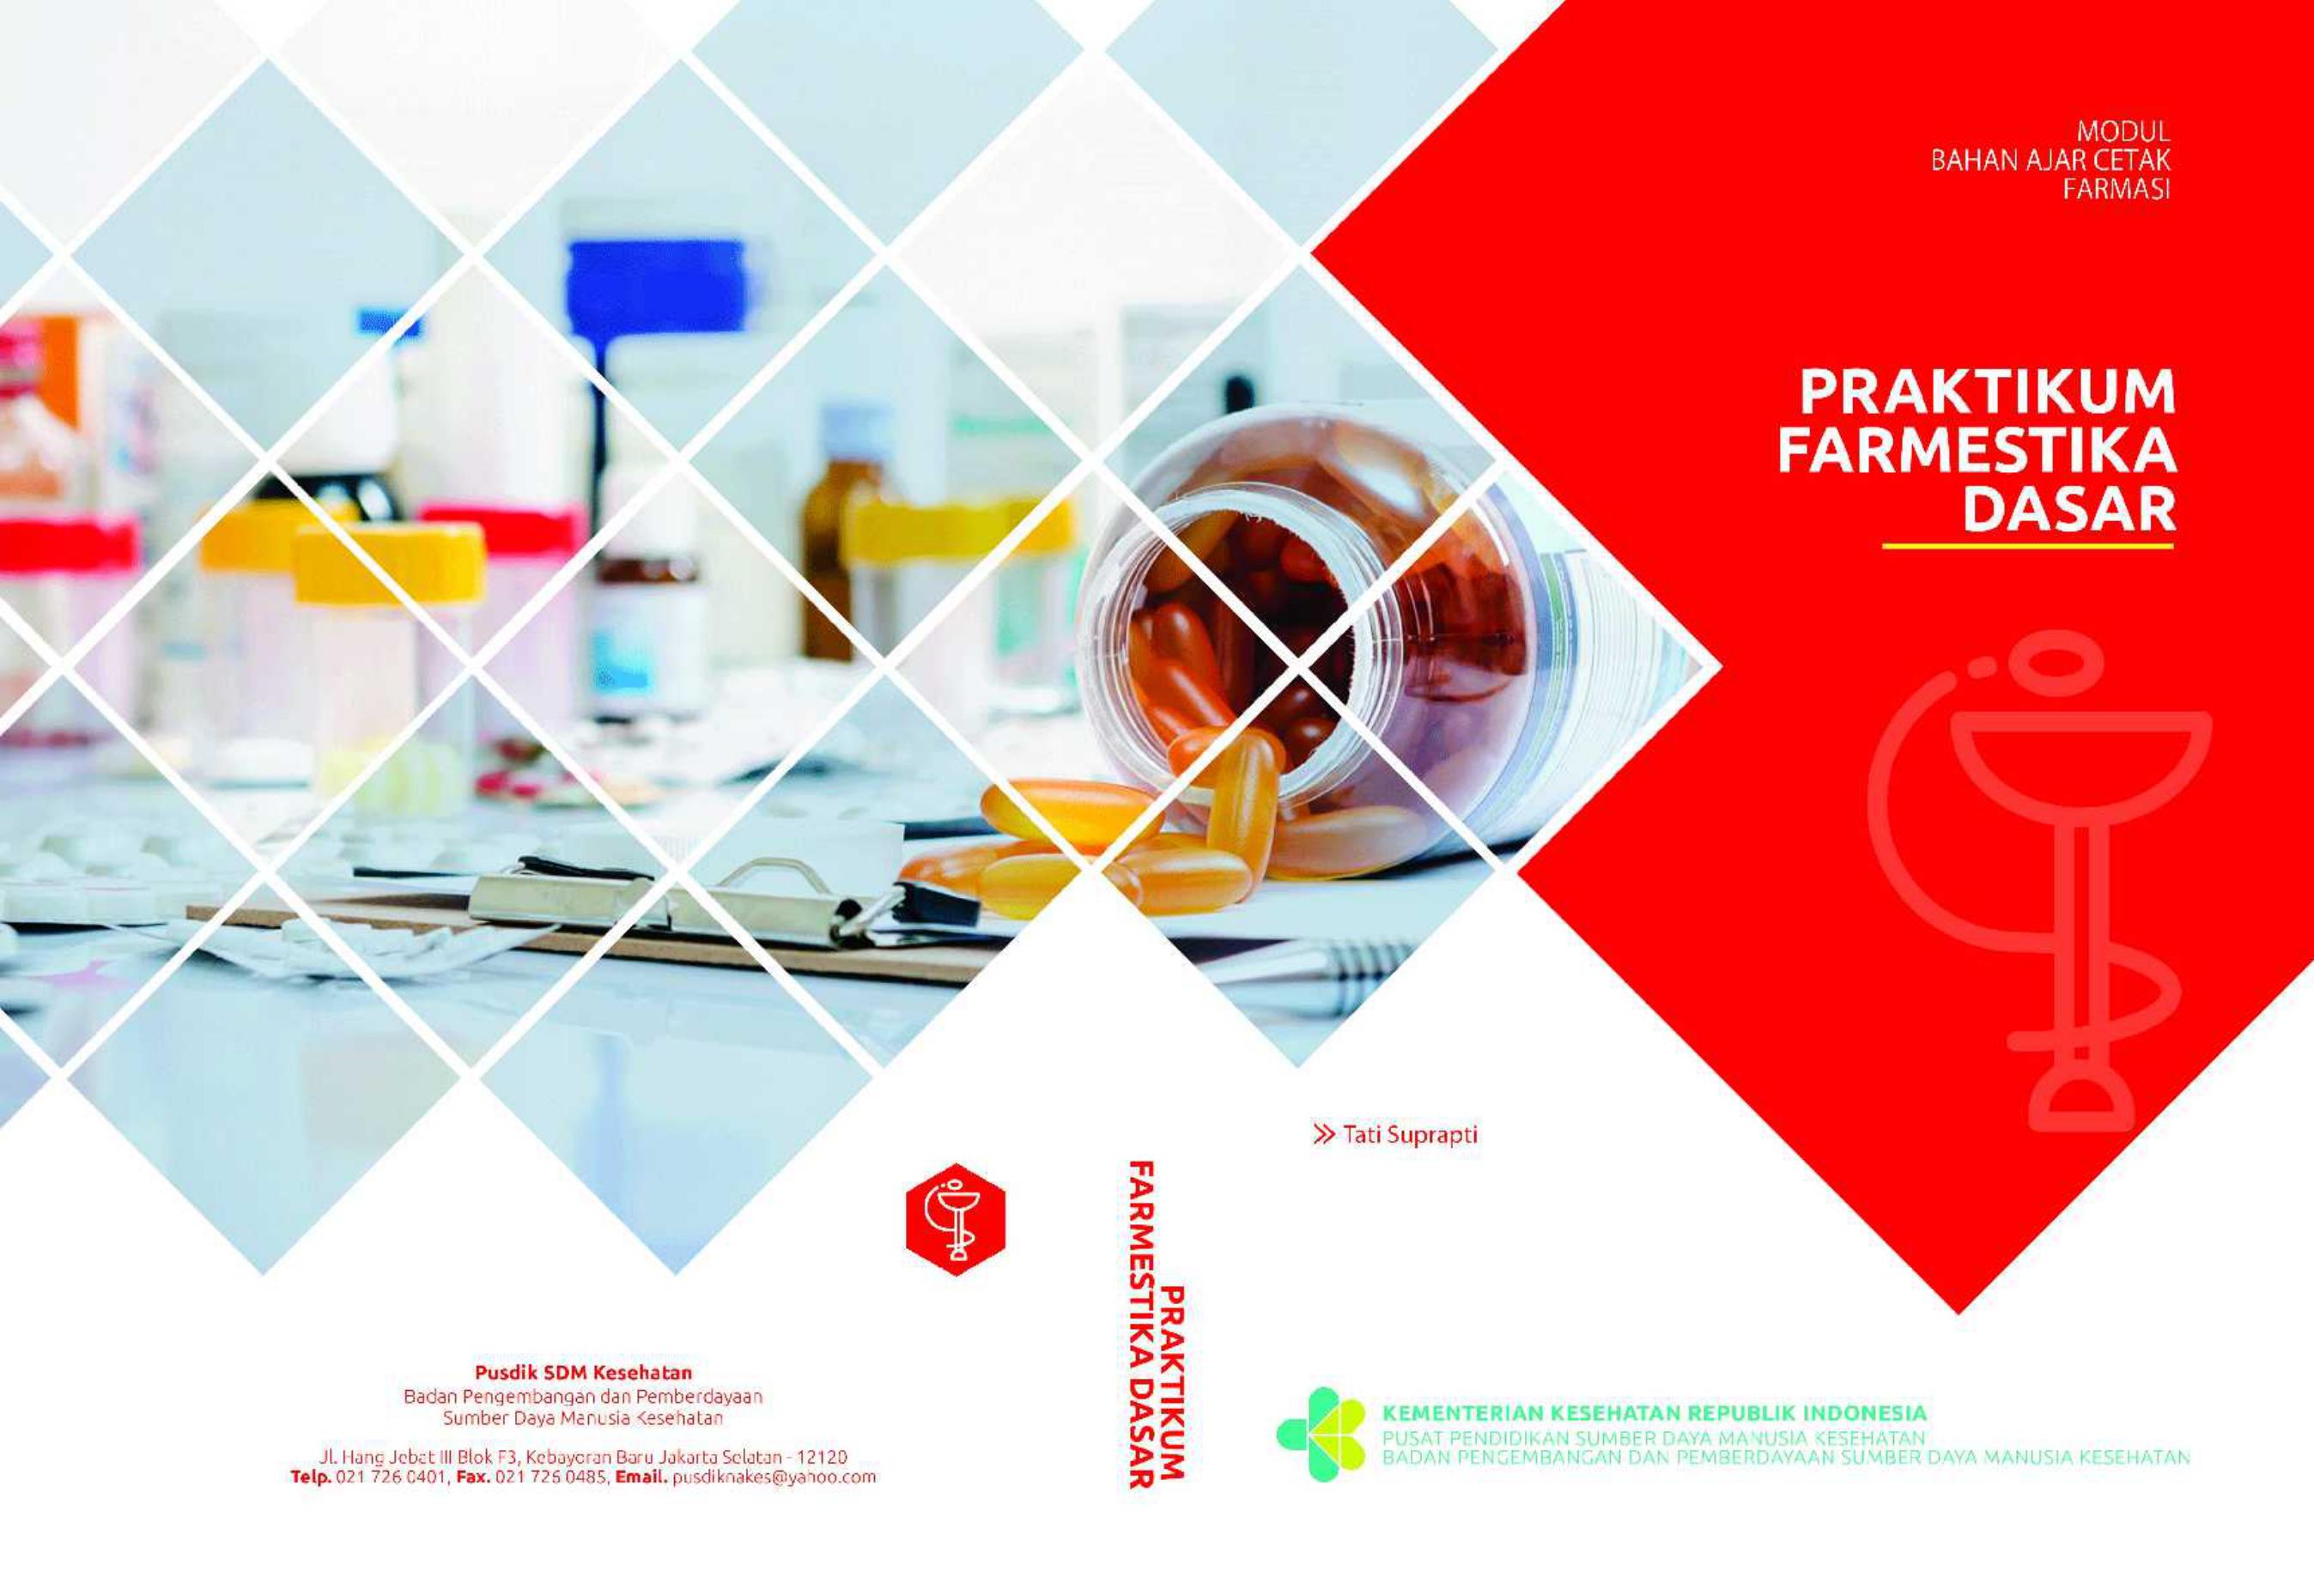 Praktikum Farmestika Dasar Farmasi